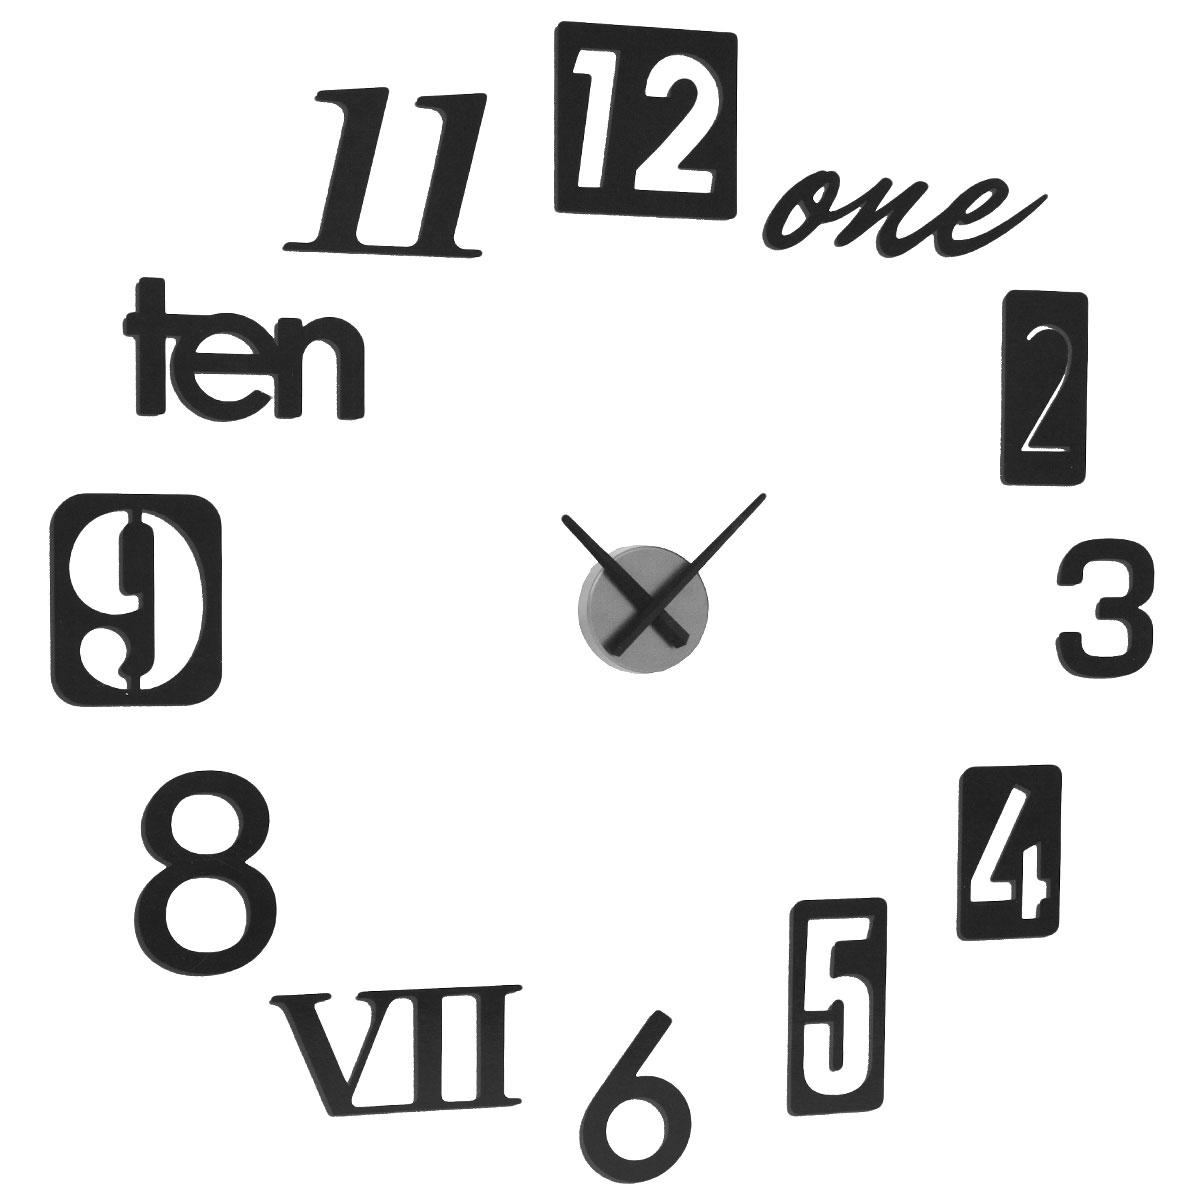 Часы настенные Umbra Numbra, цвет: черный. 118430-040 часы настенные lingua цвет черный 118990 040